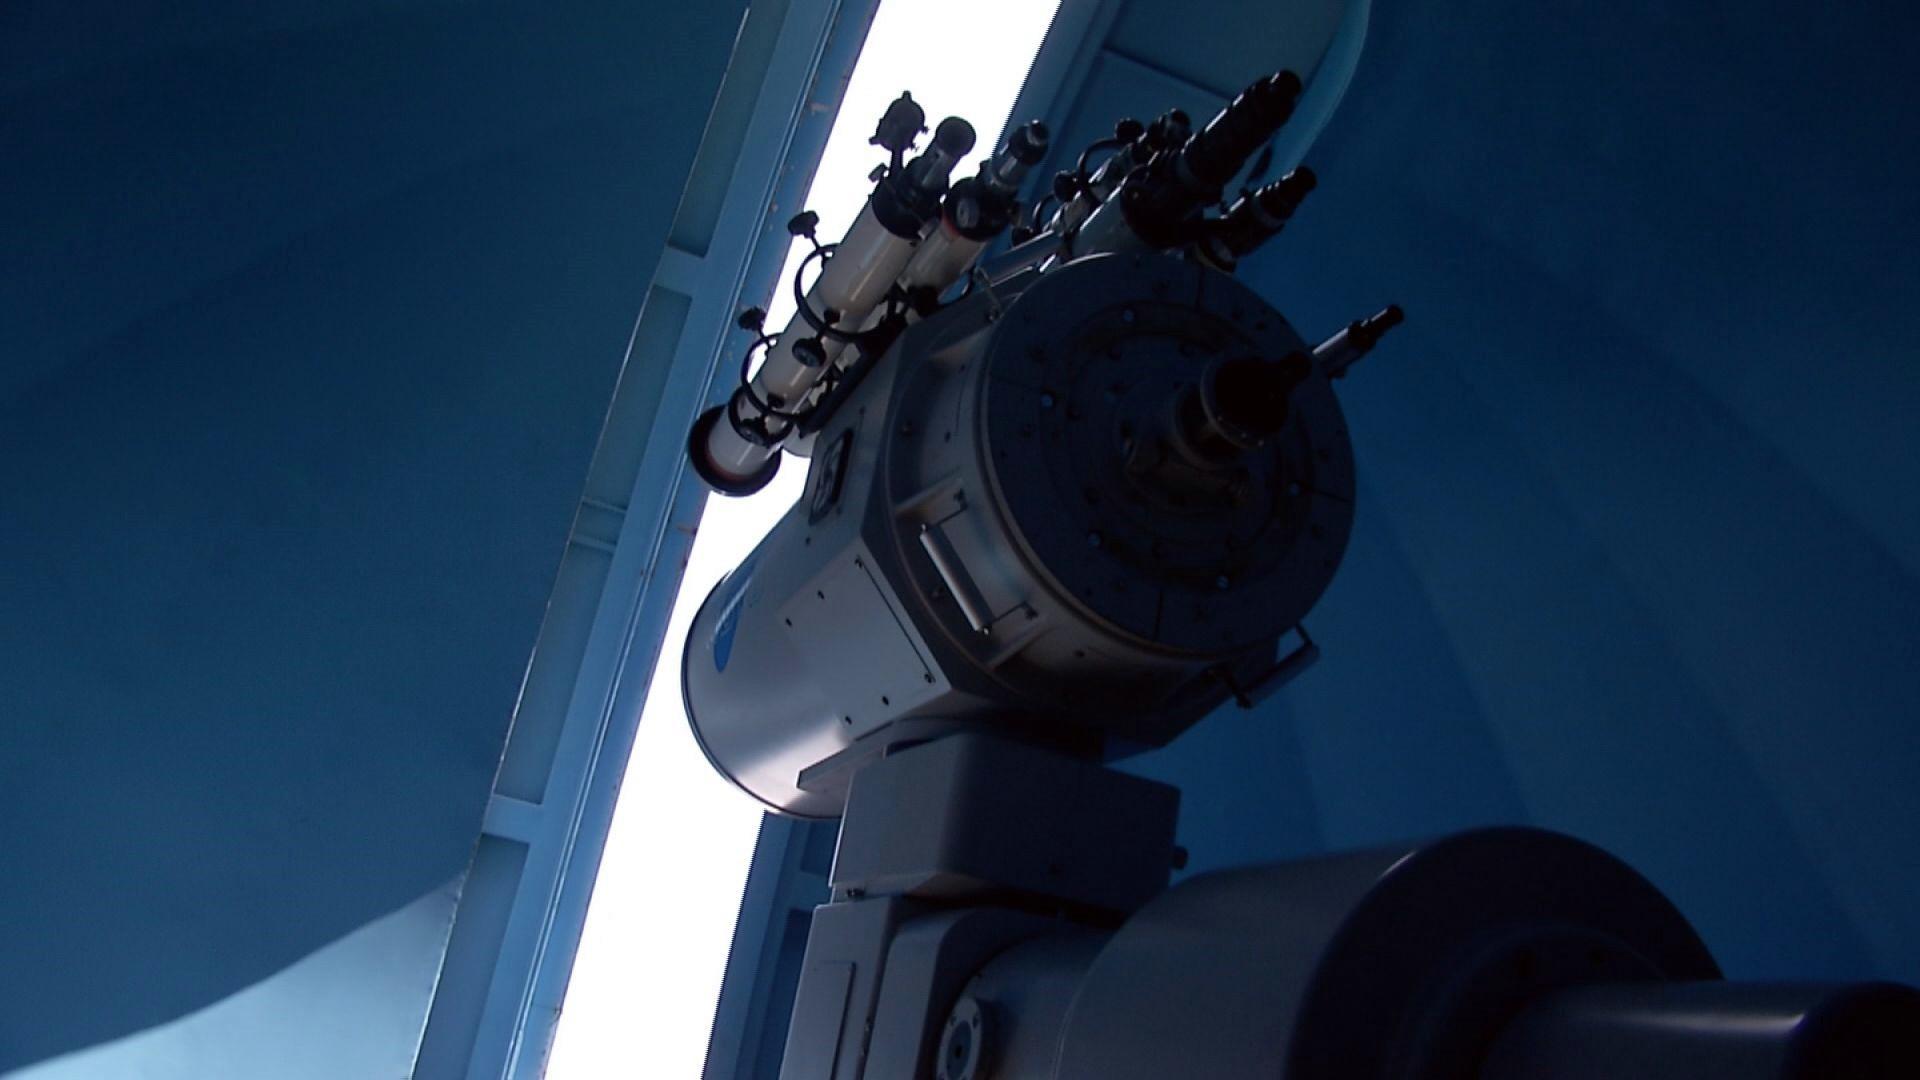 Museum Astronomi tayangkan siaran langsung panorama bulan